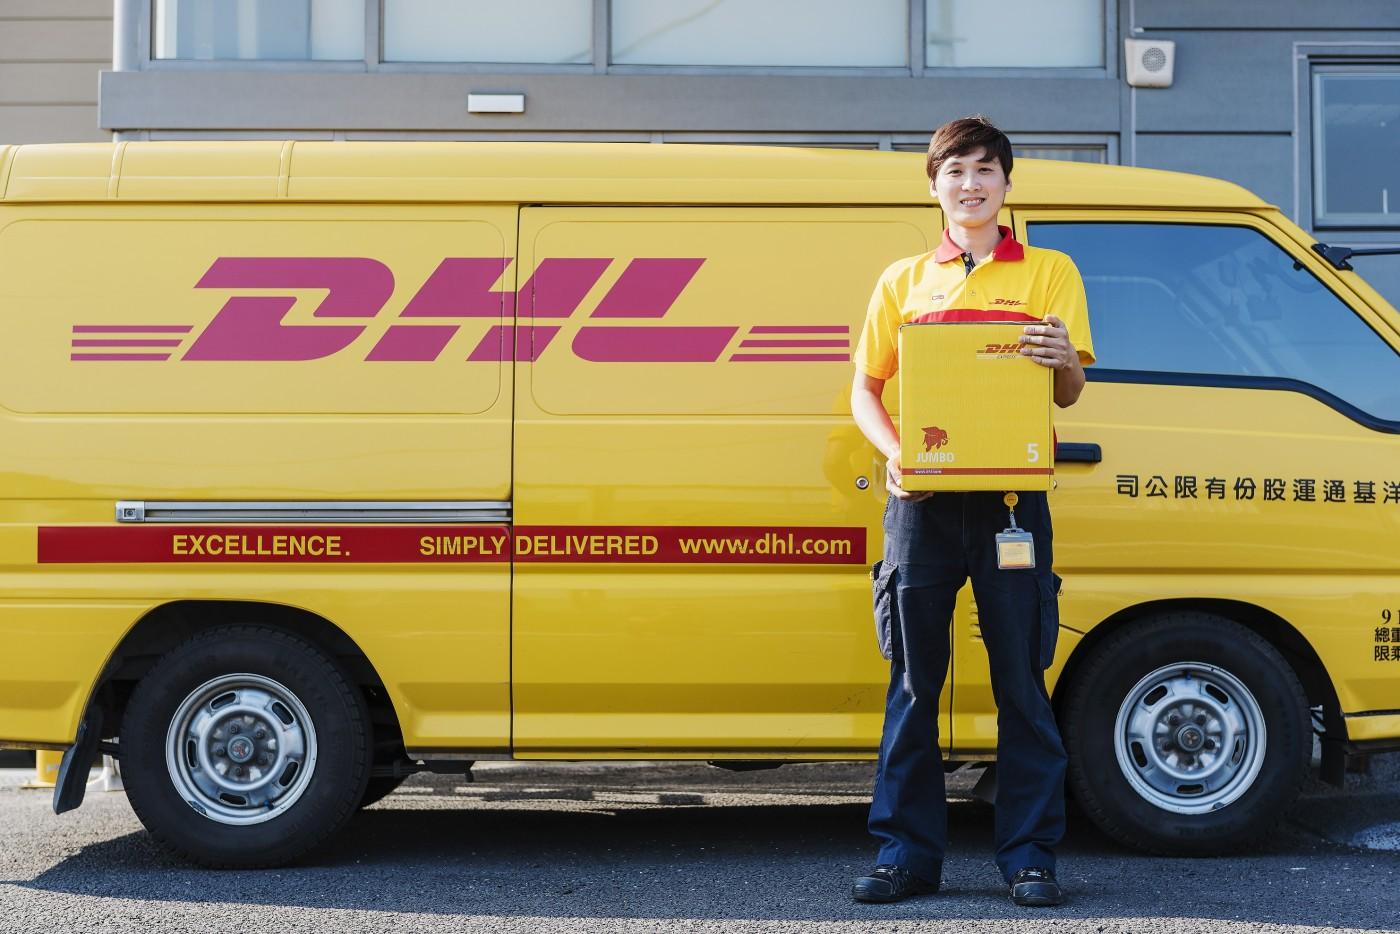 DHL國際快遞領先同業  導入行動支付-台灣Pay